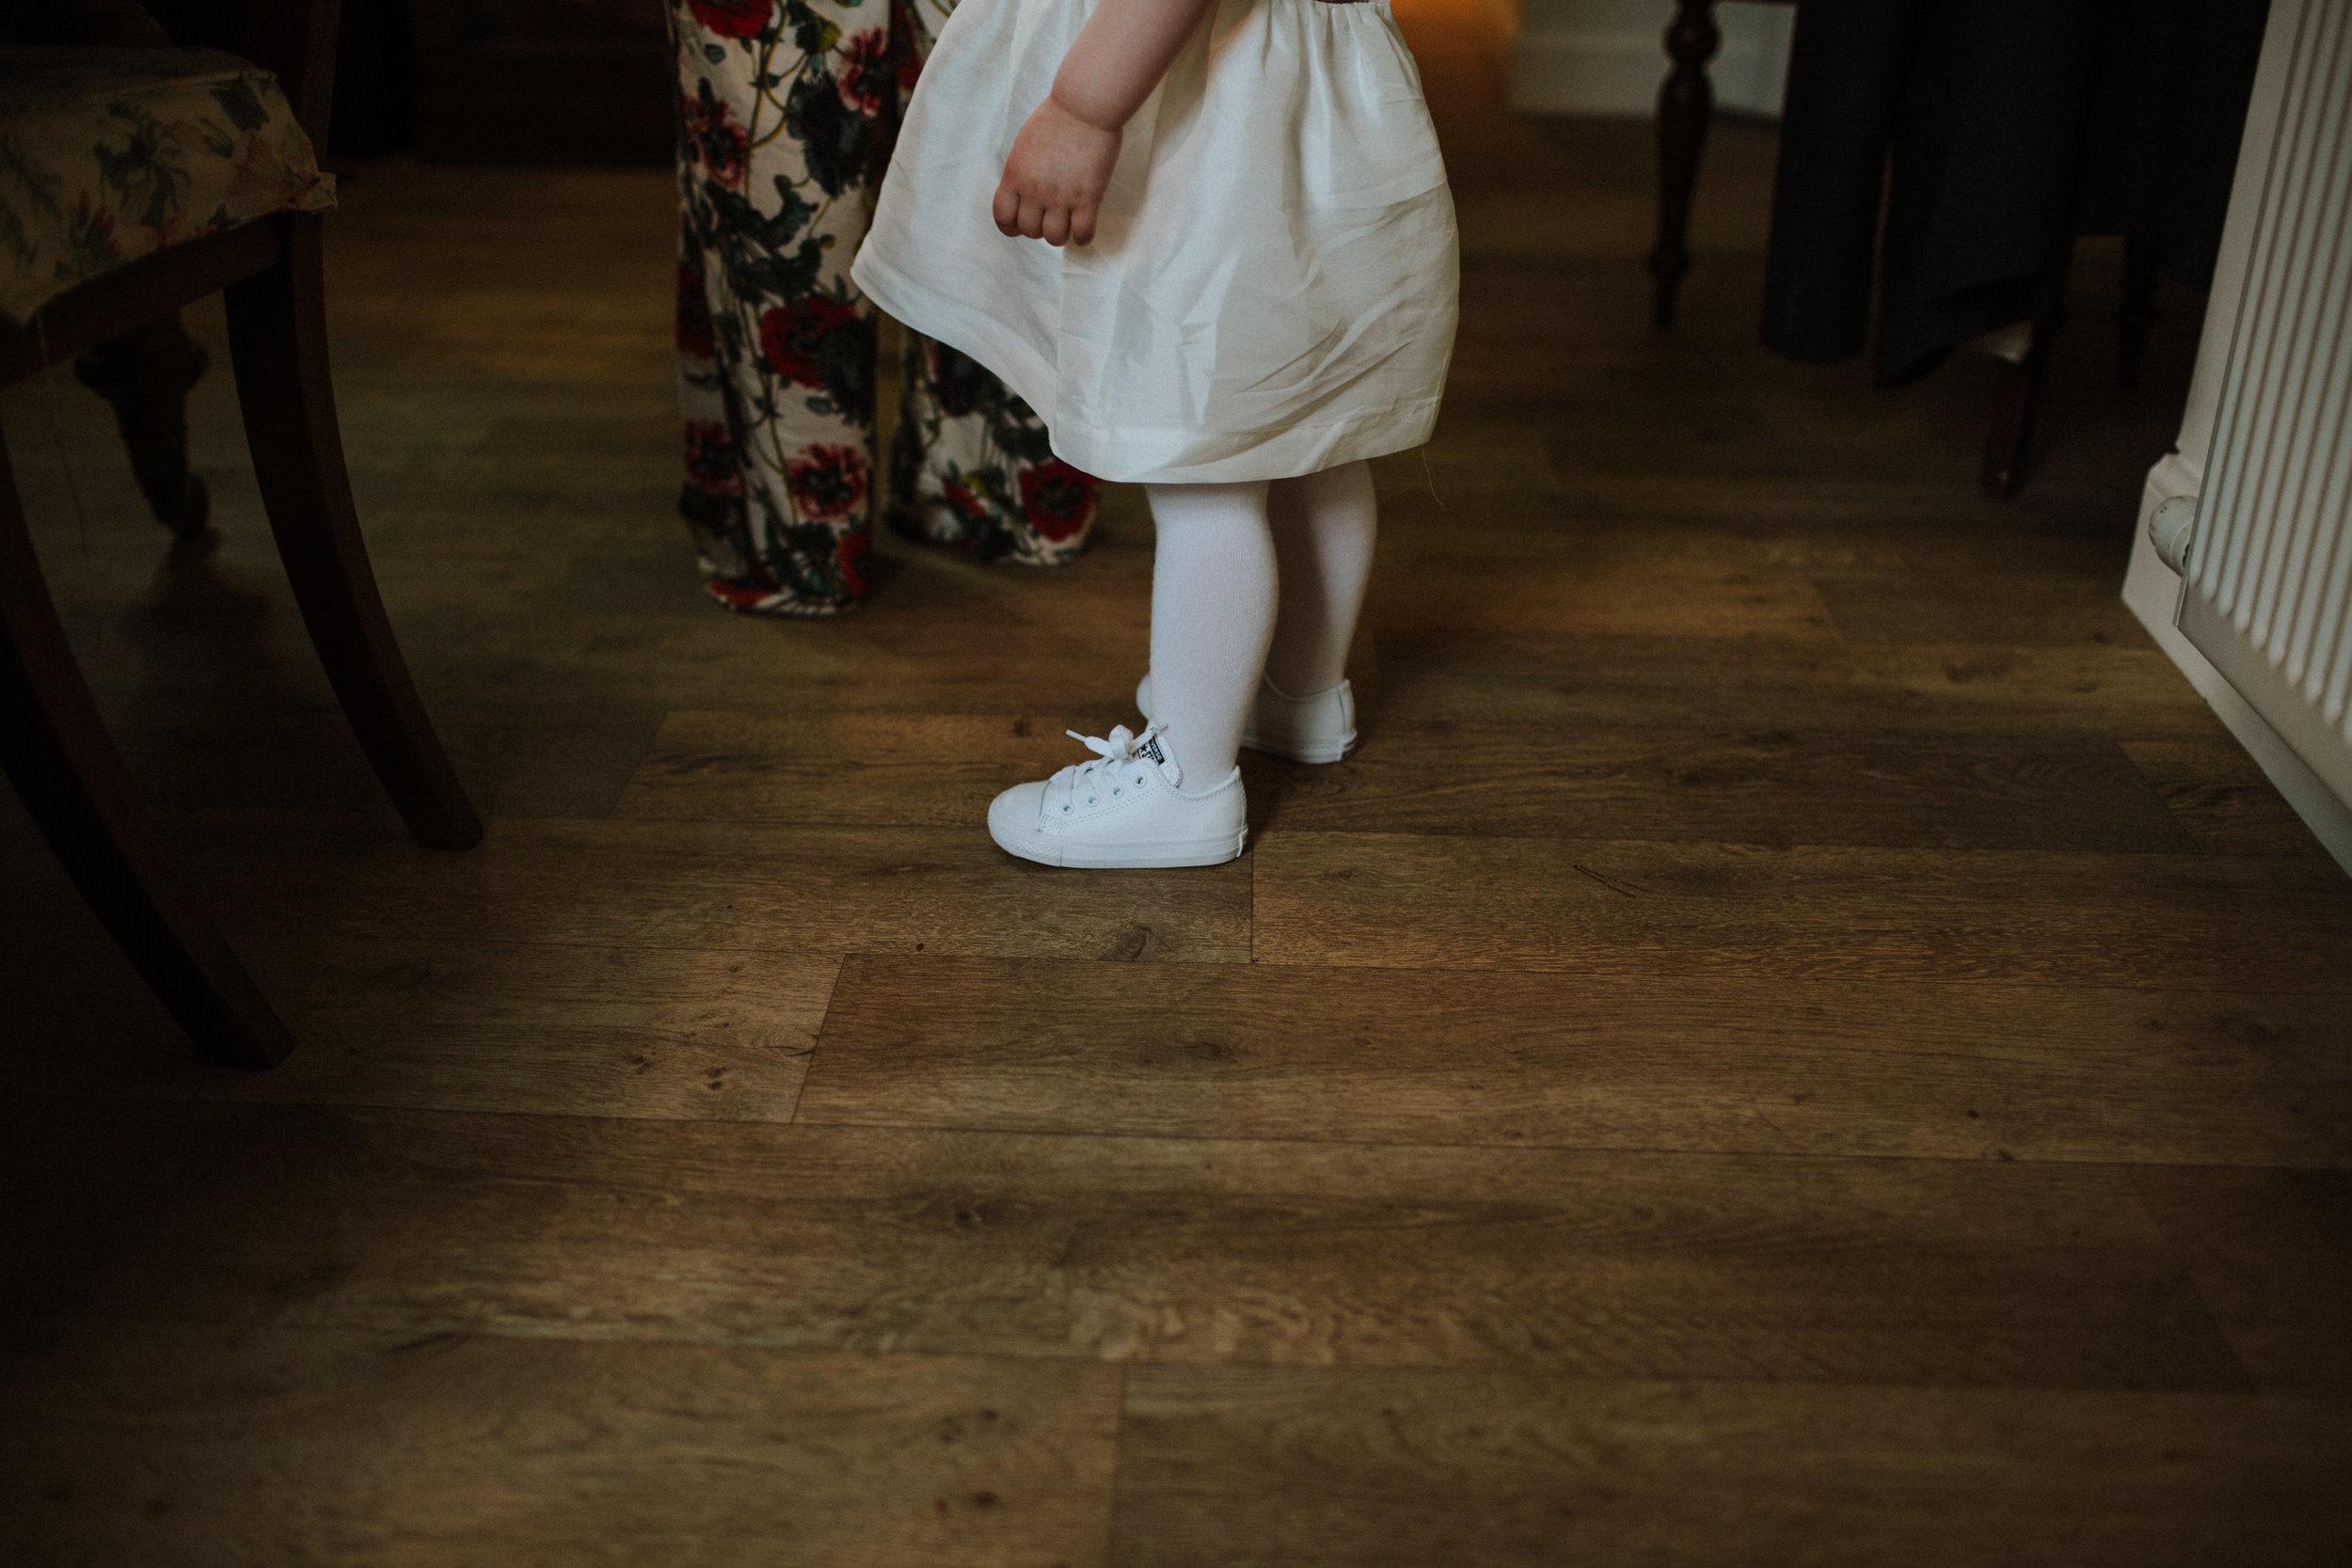 Katt-Scotland-Comrie-Crieff-Bias-Crepe-Wedding-Gown-Lace-Bridal-Biker-Jacket-Bespoke-Susanna-Greening-Derbyshire-24